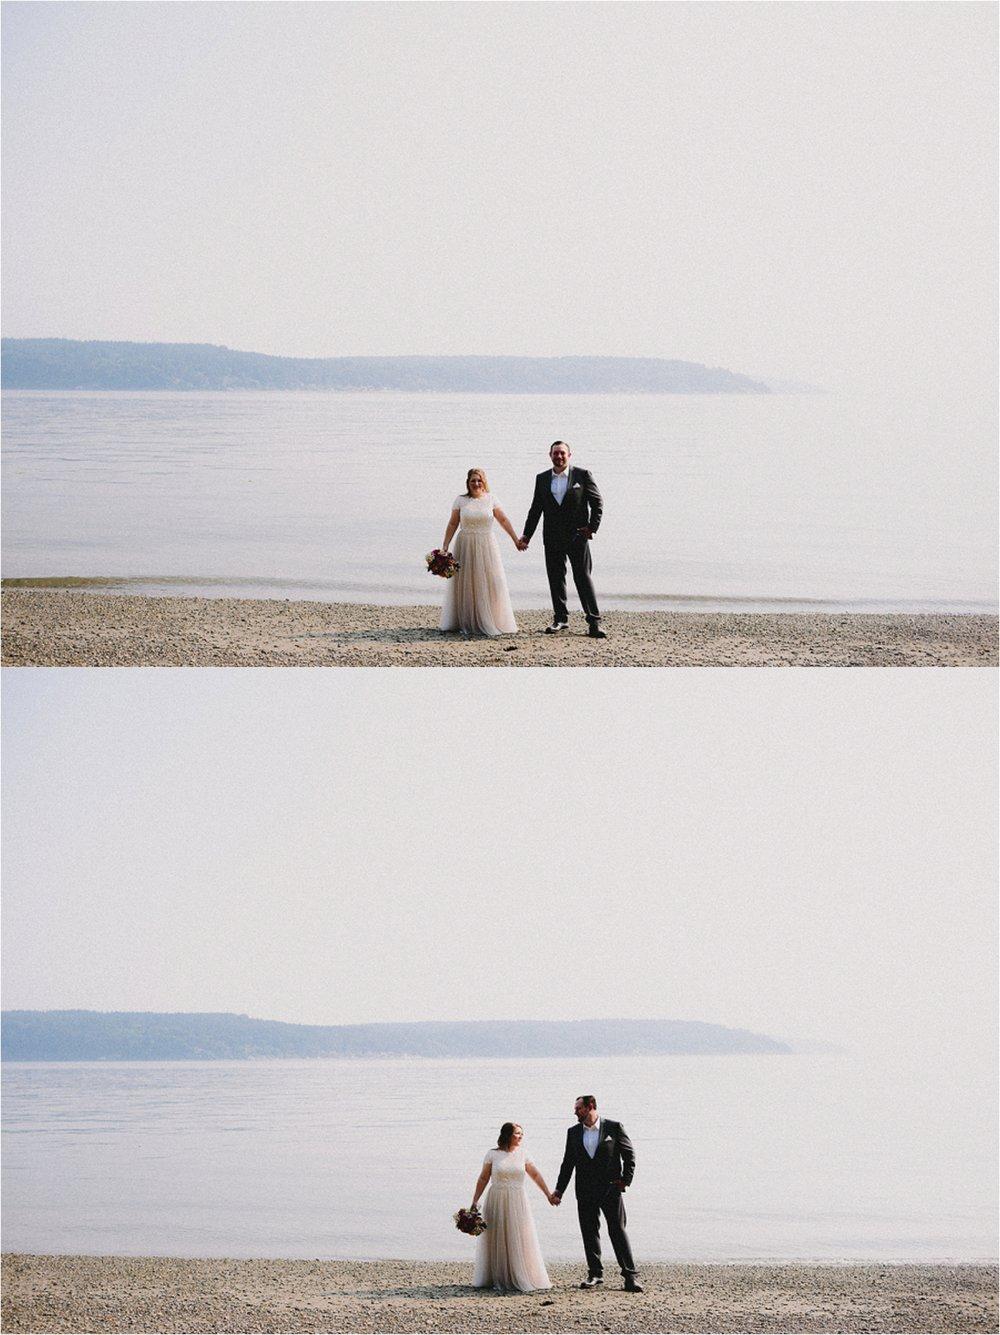 owen-beach-priest-point-park-tacoma-washington-elopement-jannicka-mayte-anchorage-alaska-wedding-elopement-photographer (13).jpg